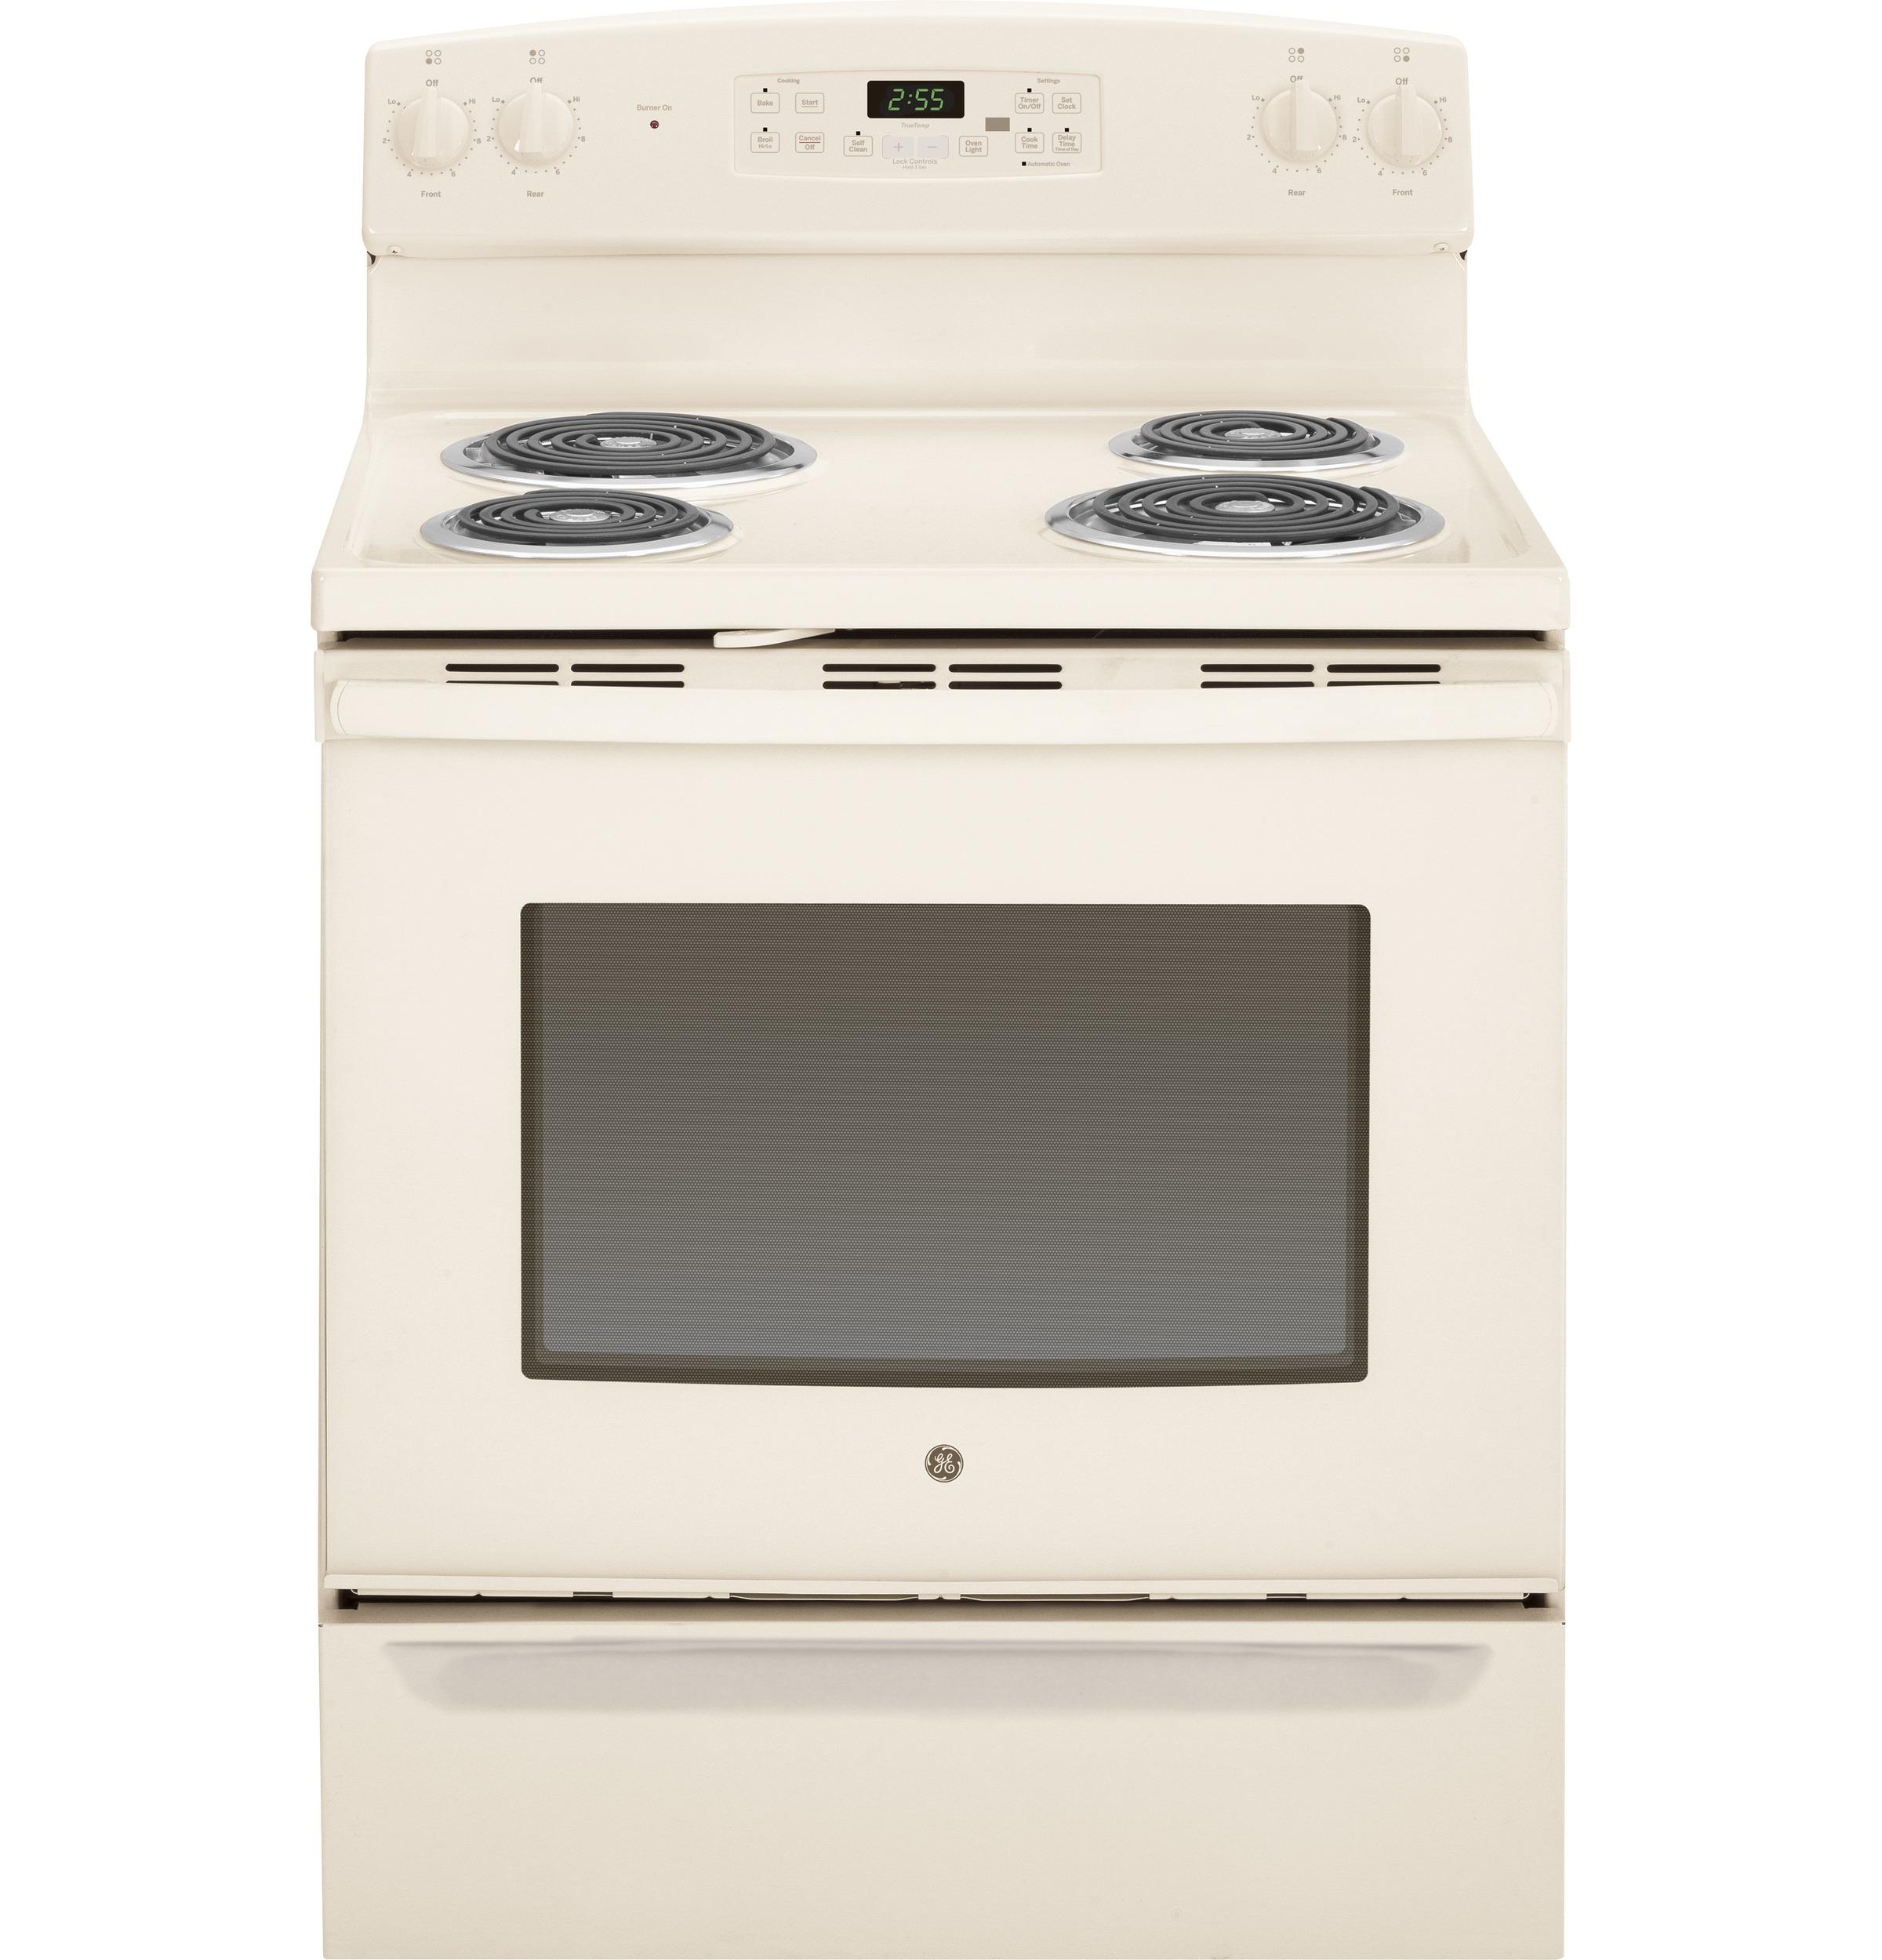 "GE Appliances GE Electric Ranges 30"" Free-Standing Electric Range - Item Number: JB255DJCC"